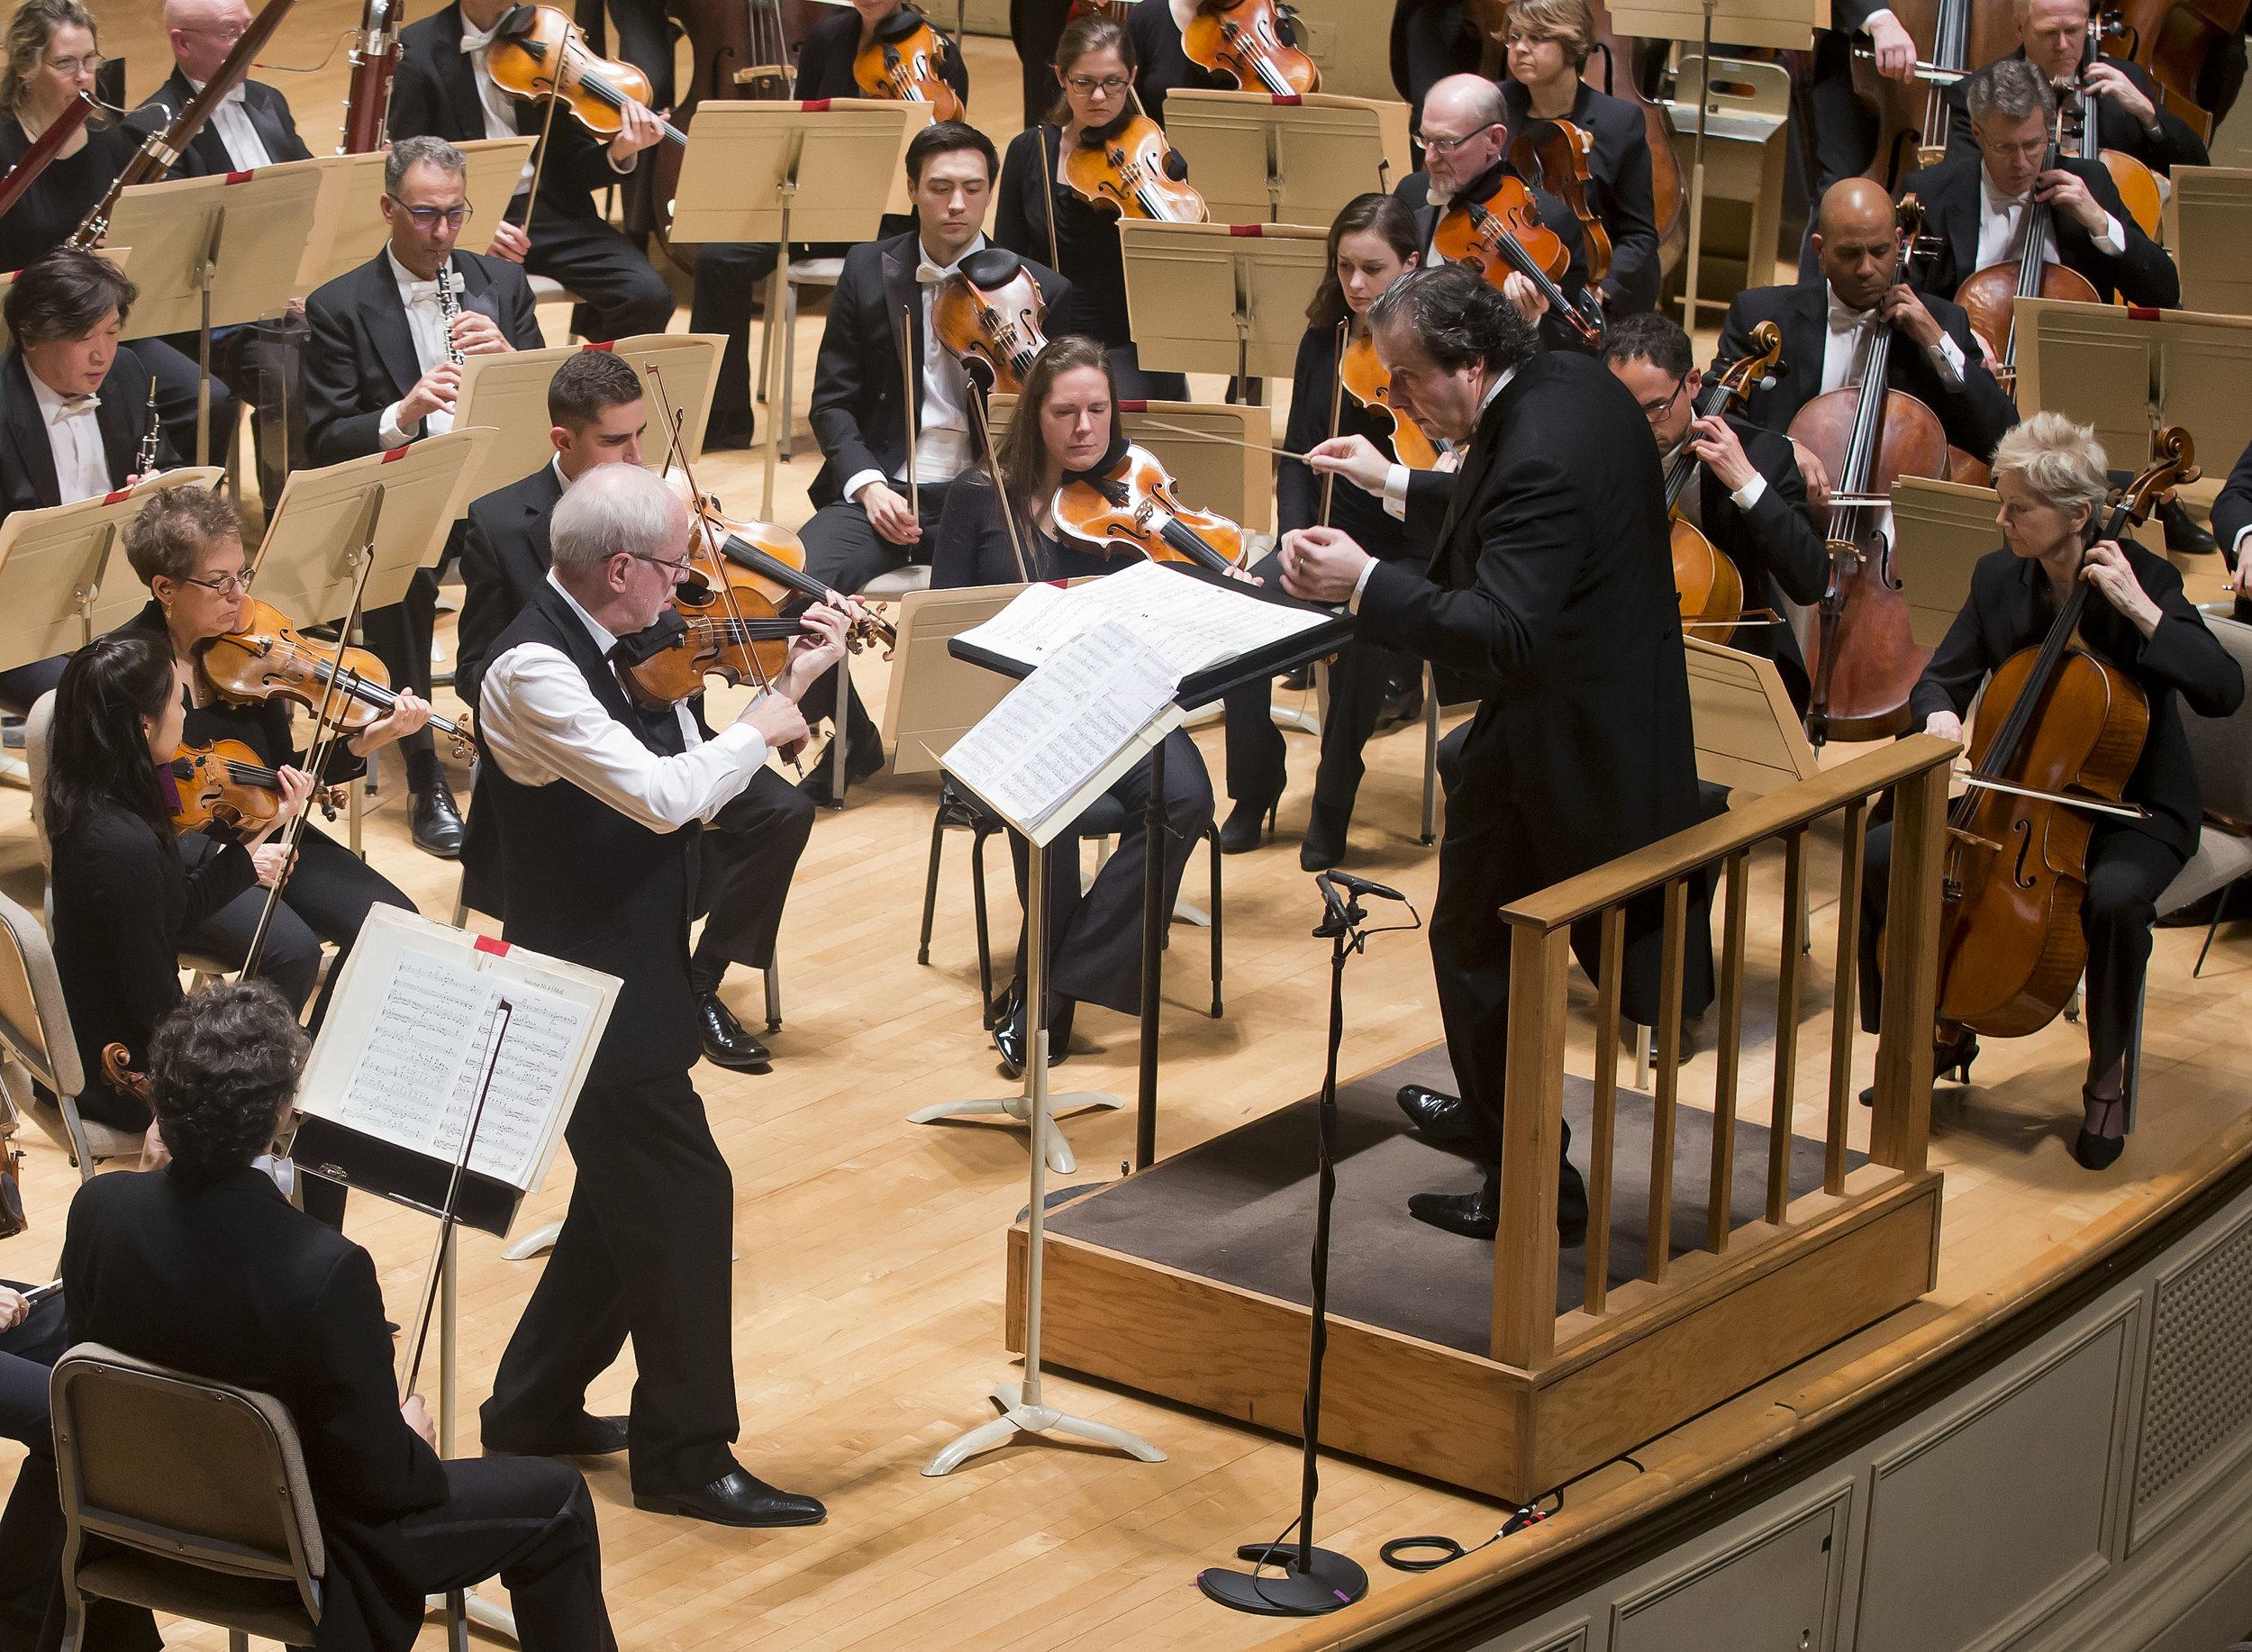 Gidon Kremer plays Mieczyslaw Weinberg's violin concerto with the Boston Symphony Orchestra, Juanjo Mena conducting, Jan. 19, 2017. Winslow Townson photograph.